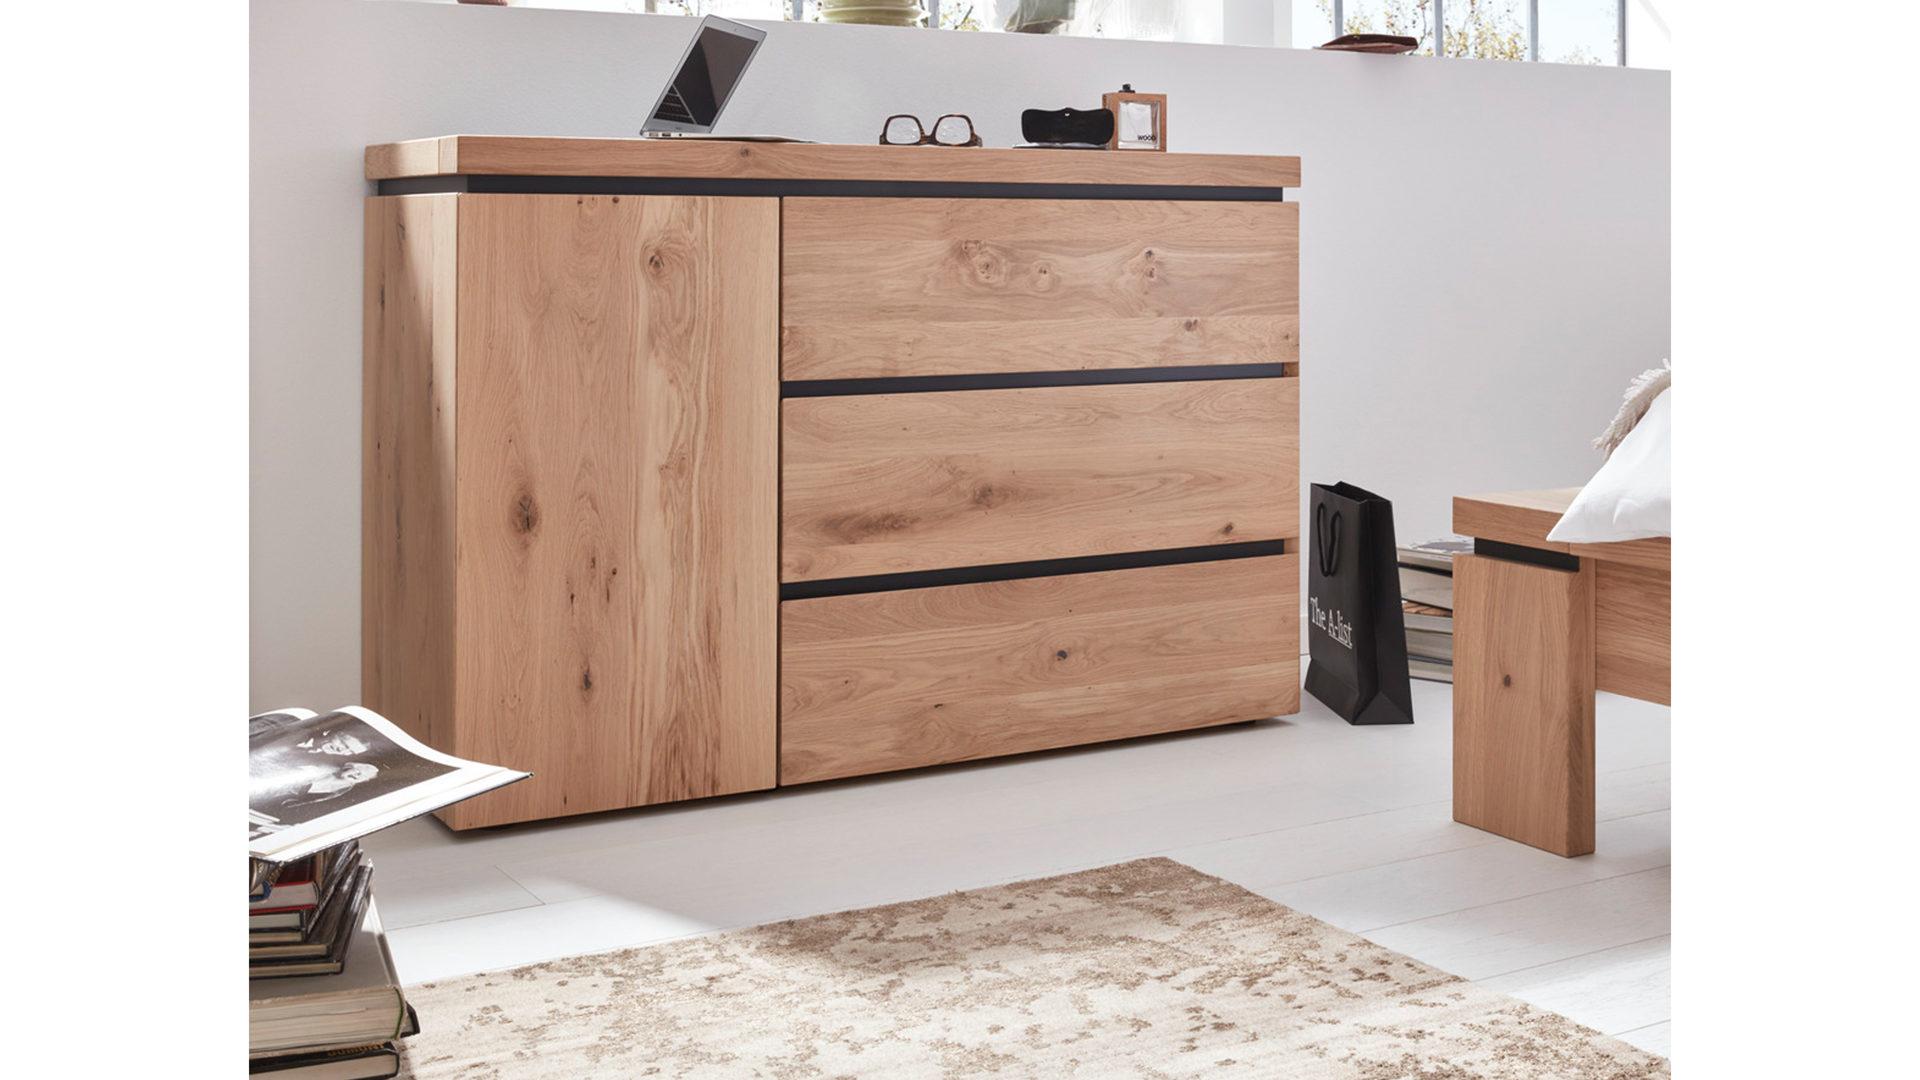 Tür Schlafzimmer | Mobel Boer Coesfeld Markenshops Esszimmer Interliving